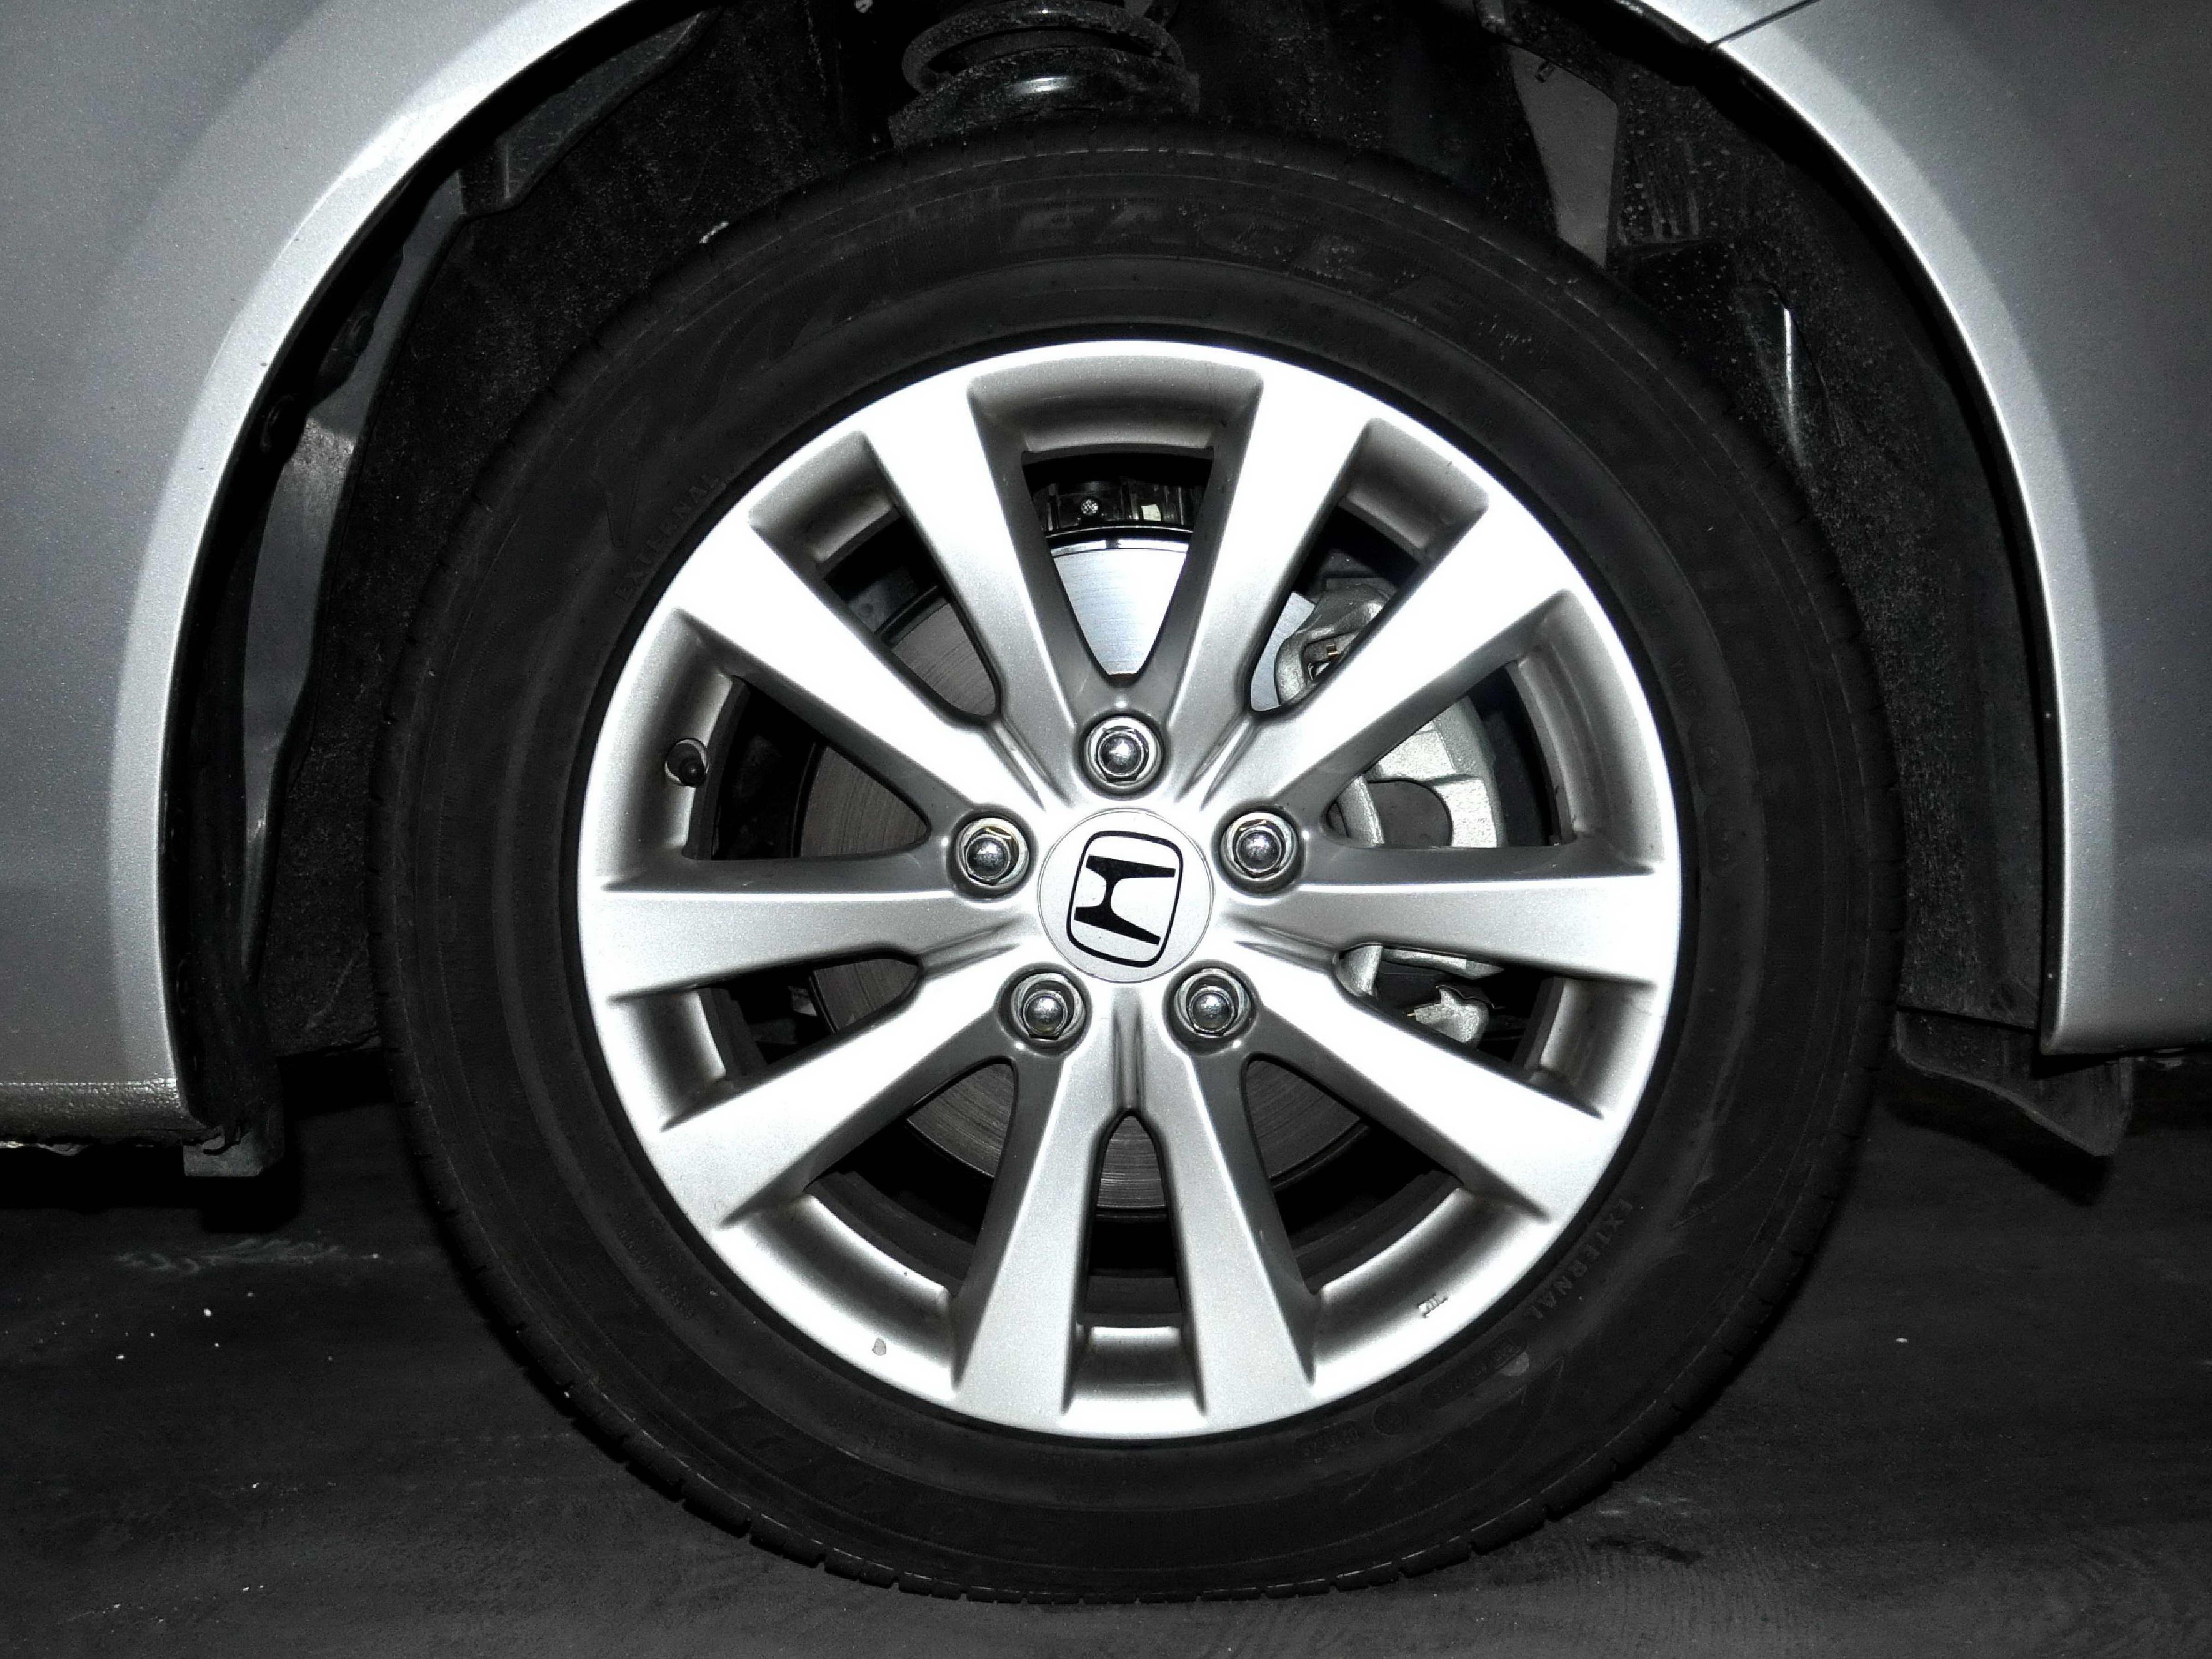 Free photograph; detailed, image, metallic, alloy, wheels